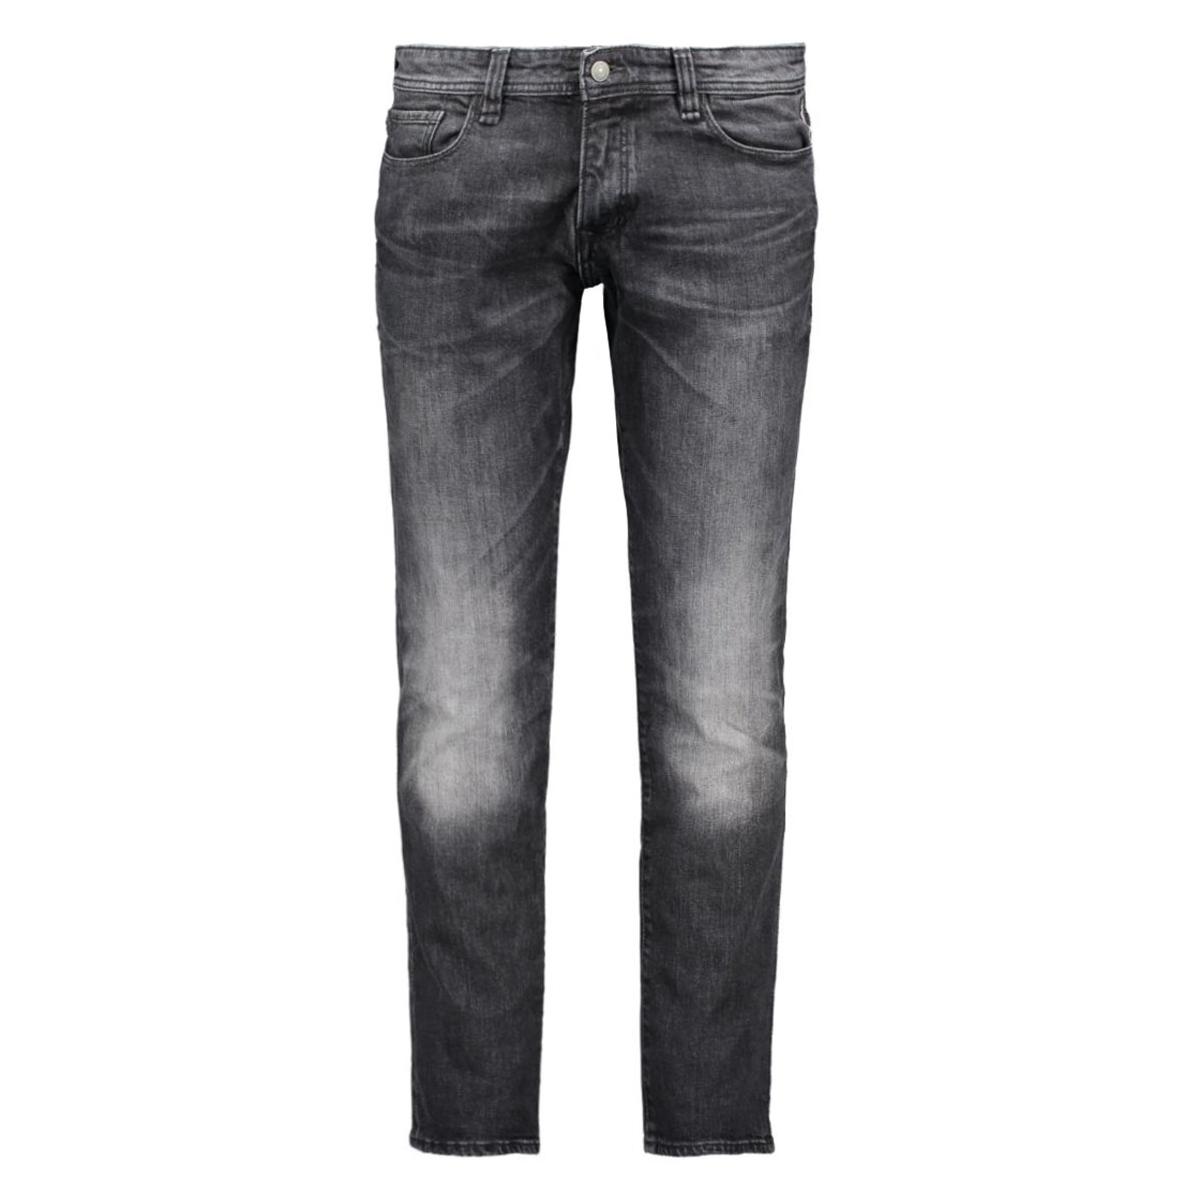 086cc2b004 edc jeans c001